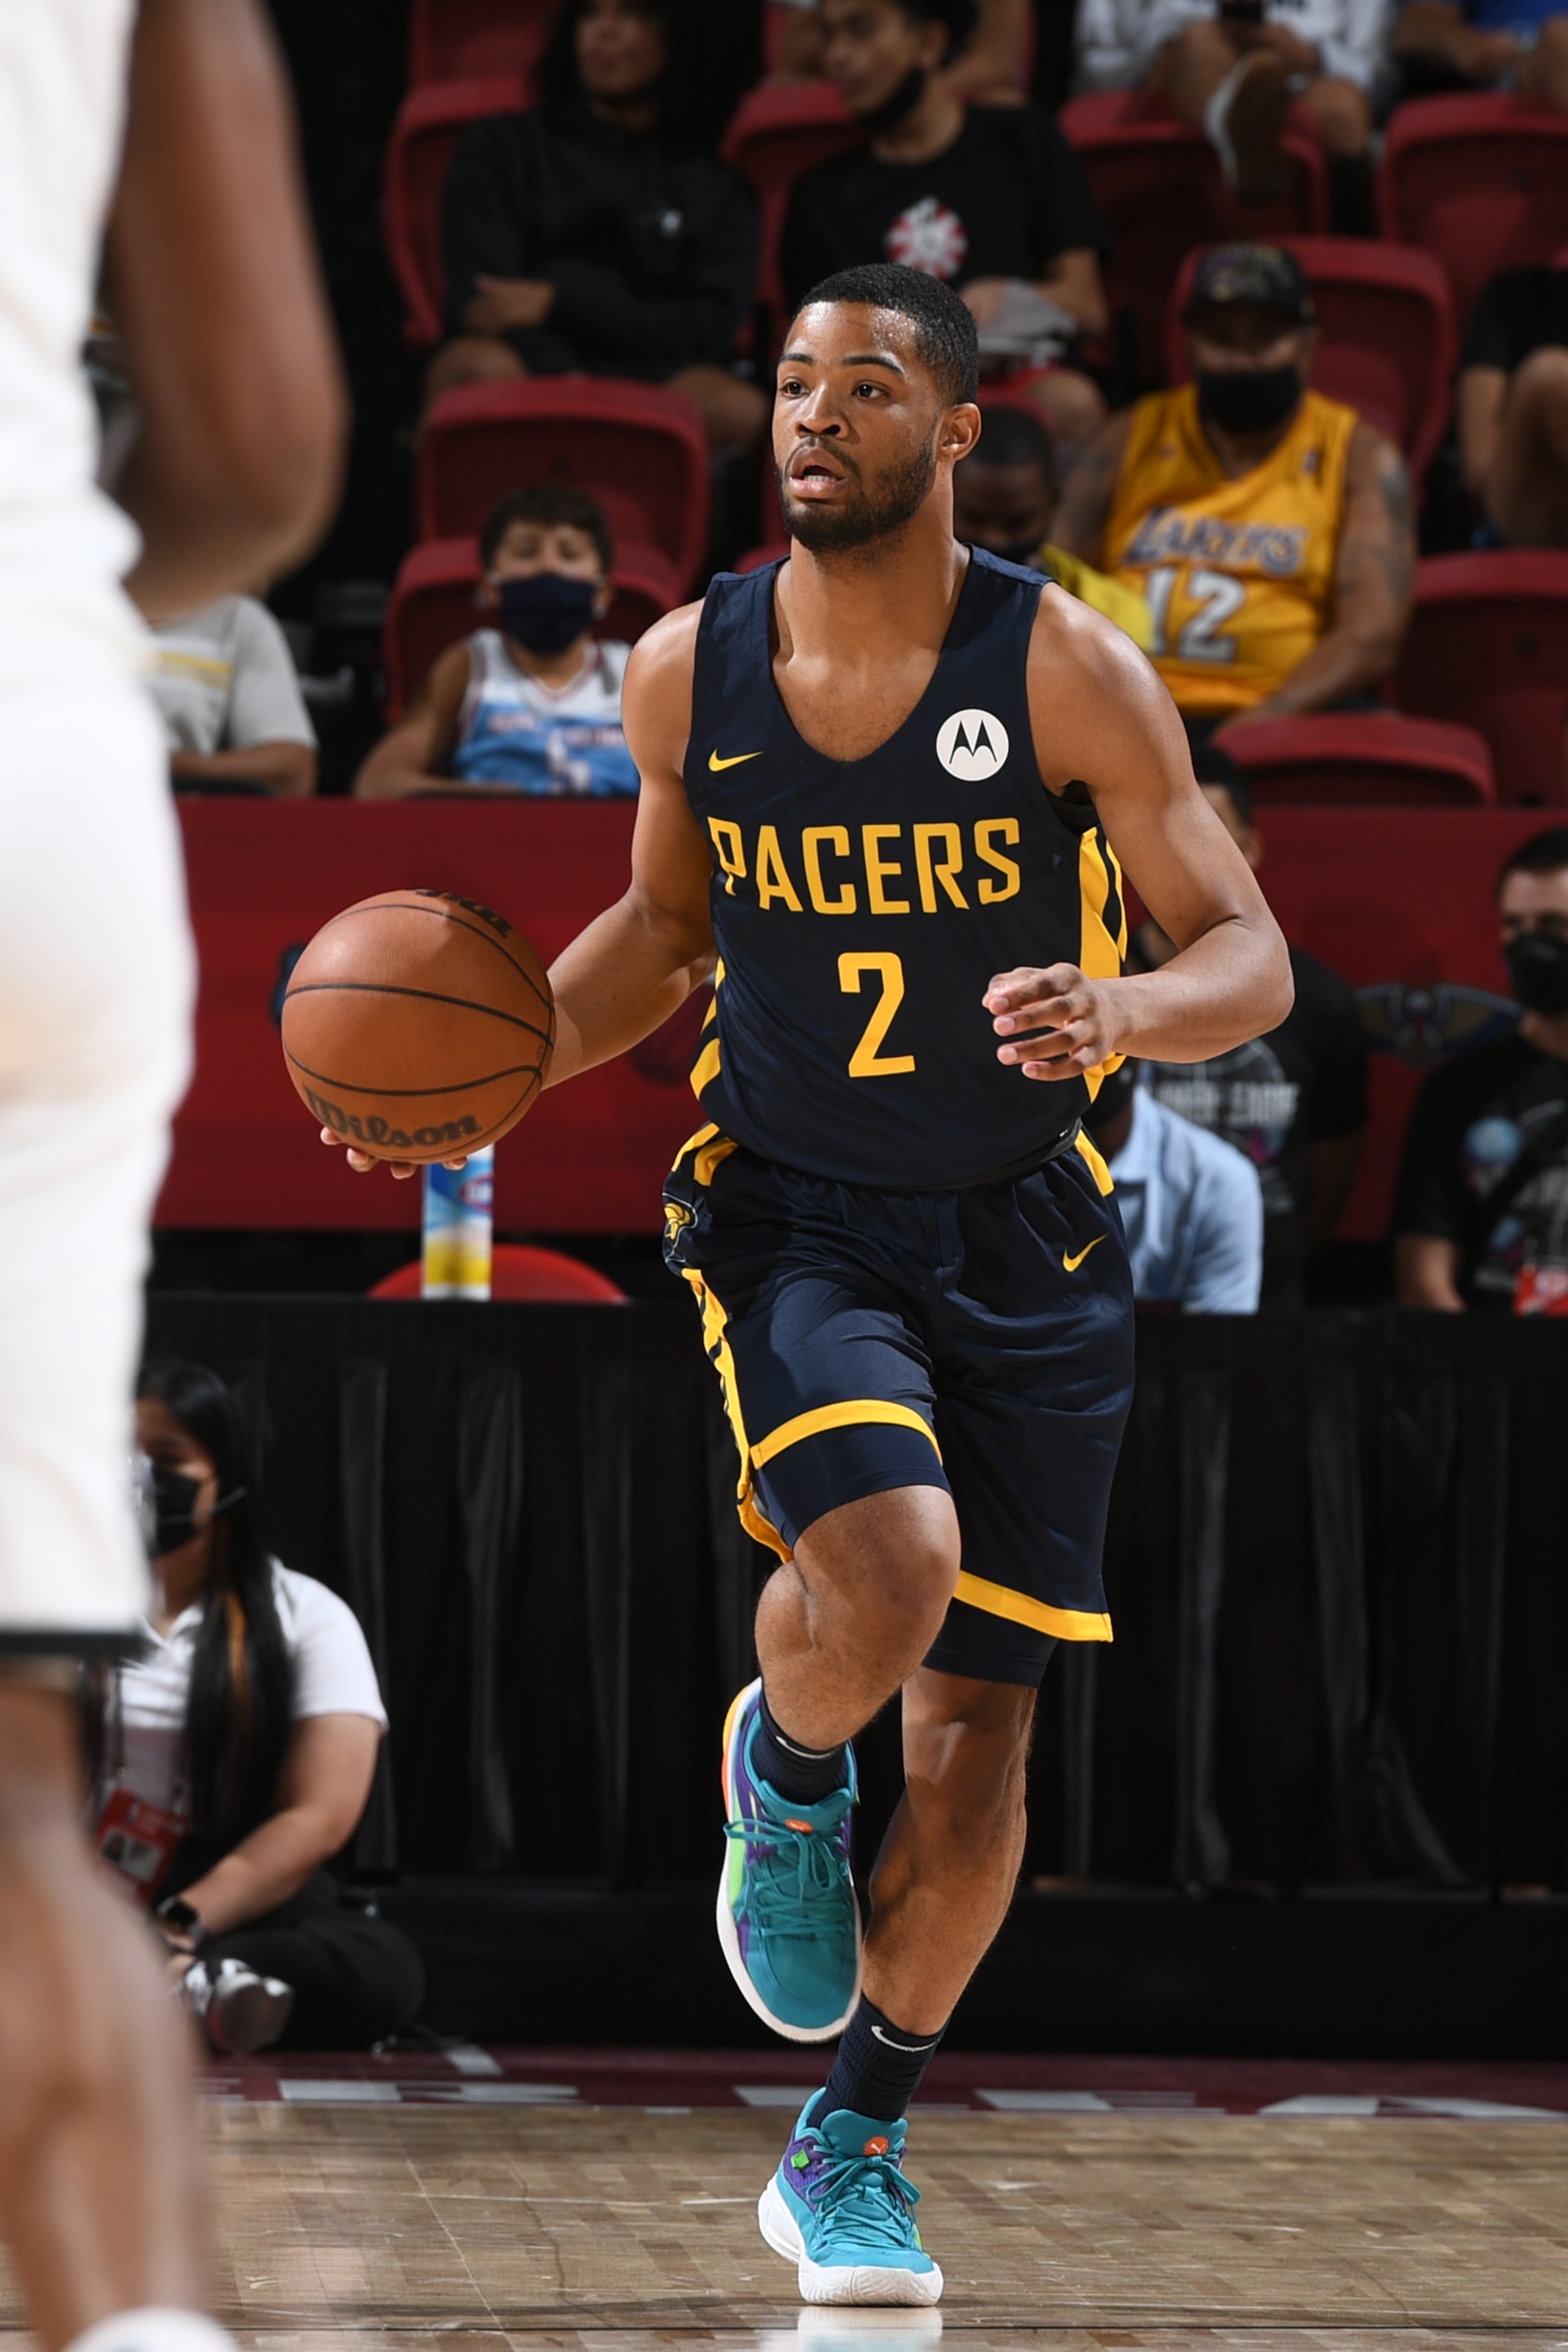 2021 Las Vegas Summer League - Indiana Pacers v Portland Trailblazers